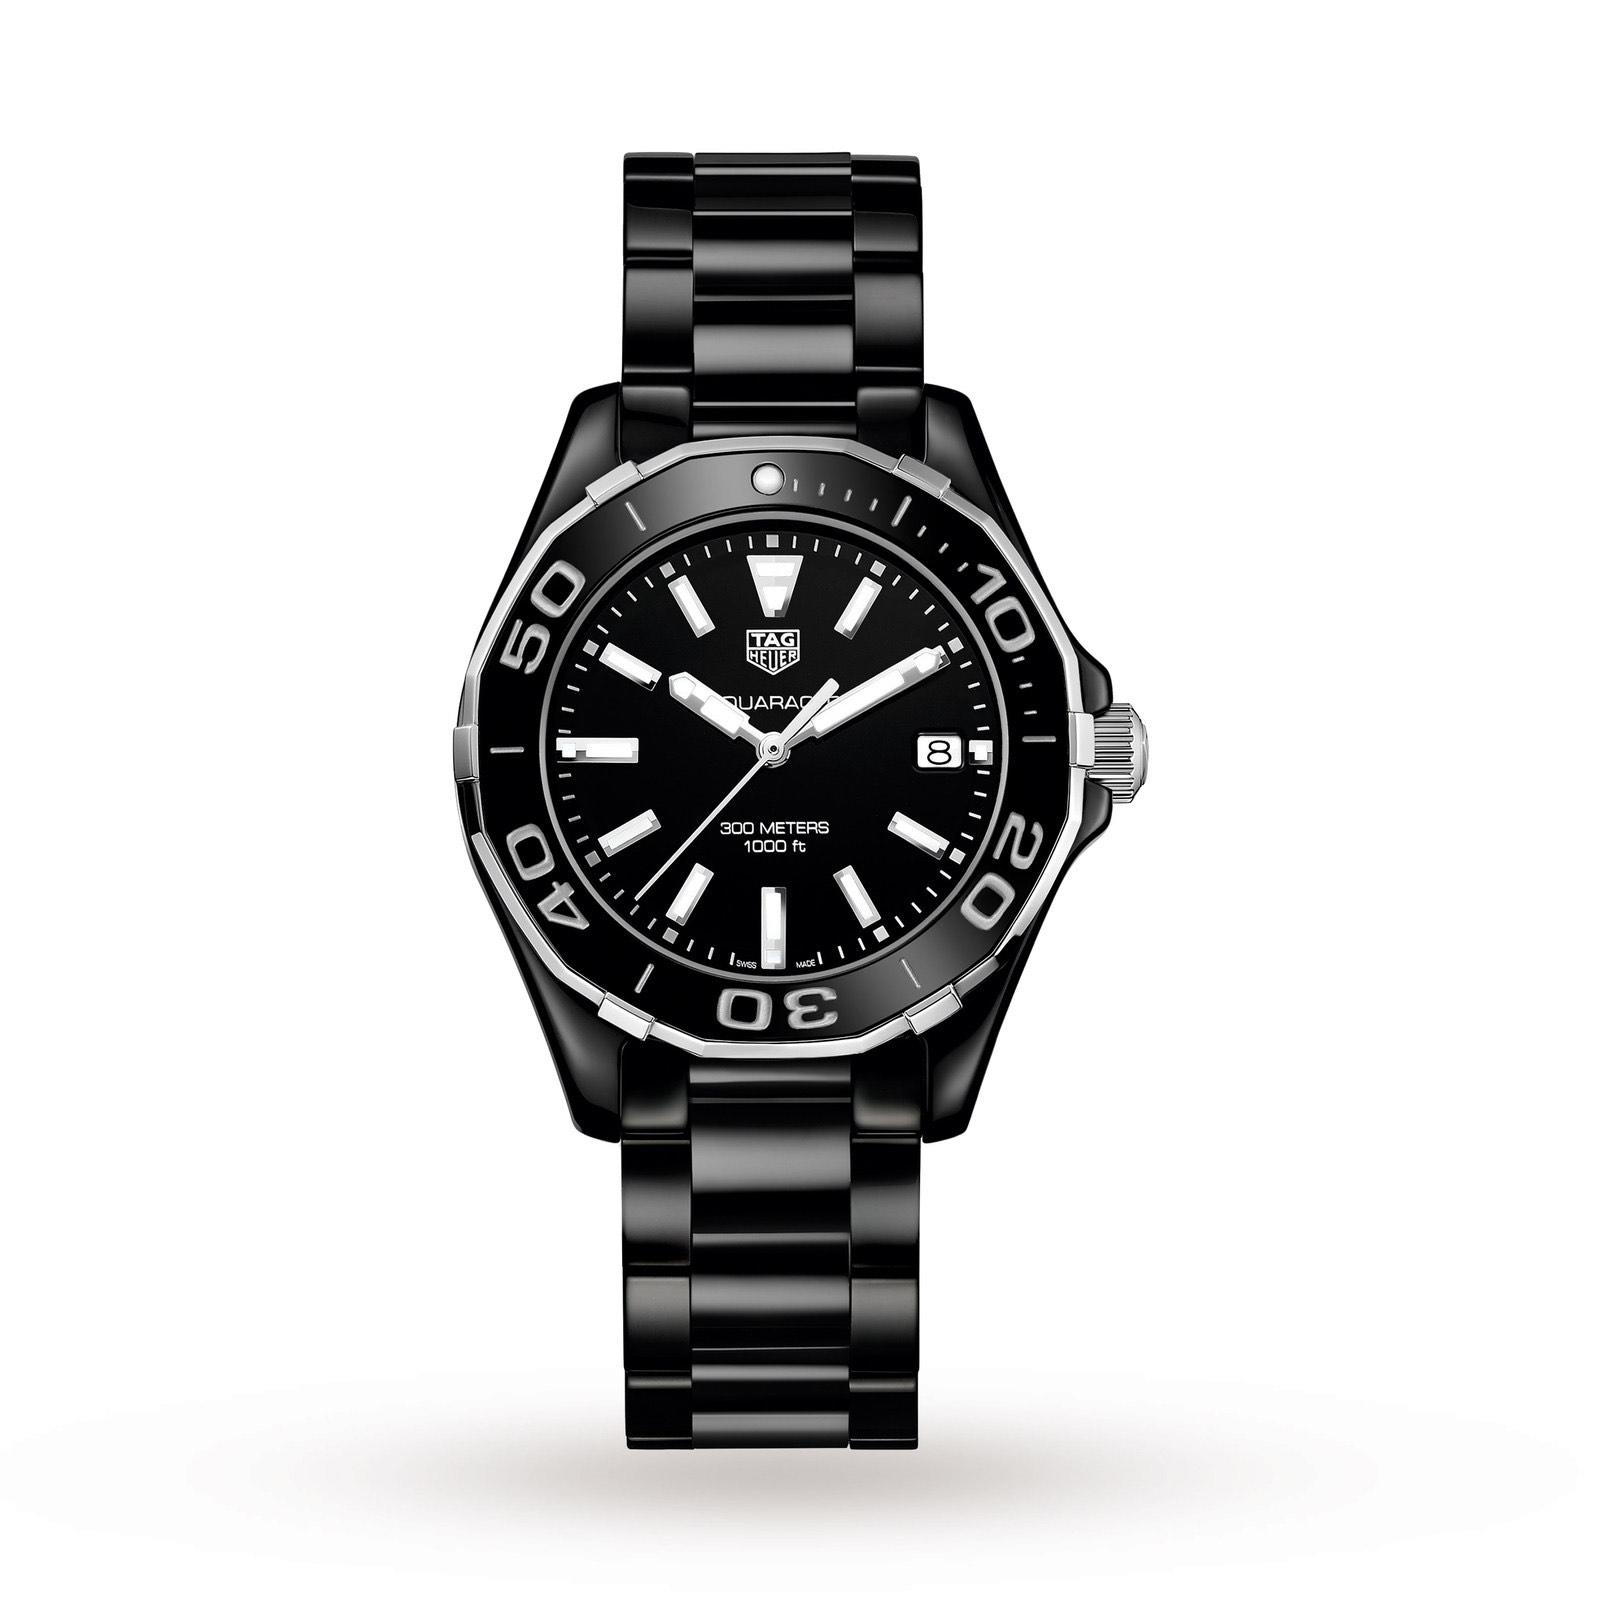 Tag Heuer AquaRacer 35mm Ceramic WAY1390.BH0716 Watch - £1050 @ Burrells